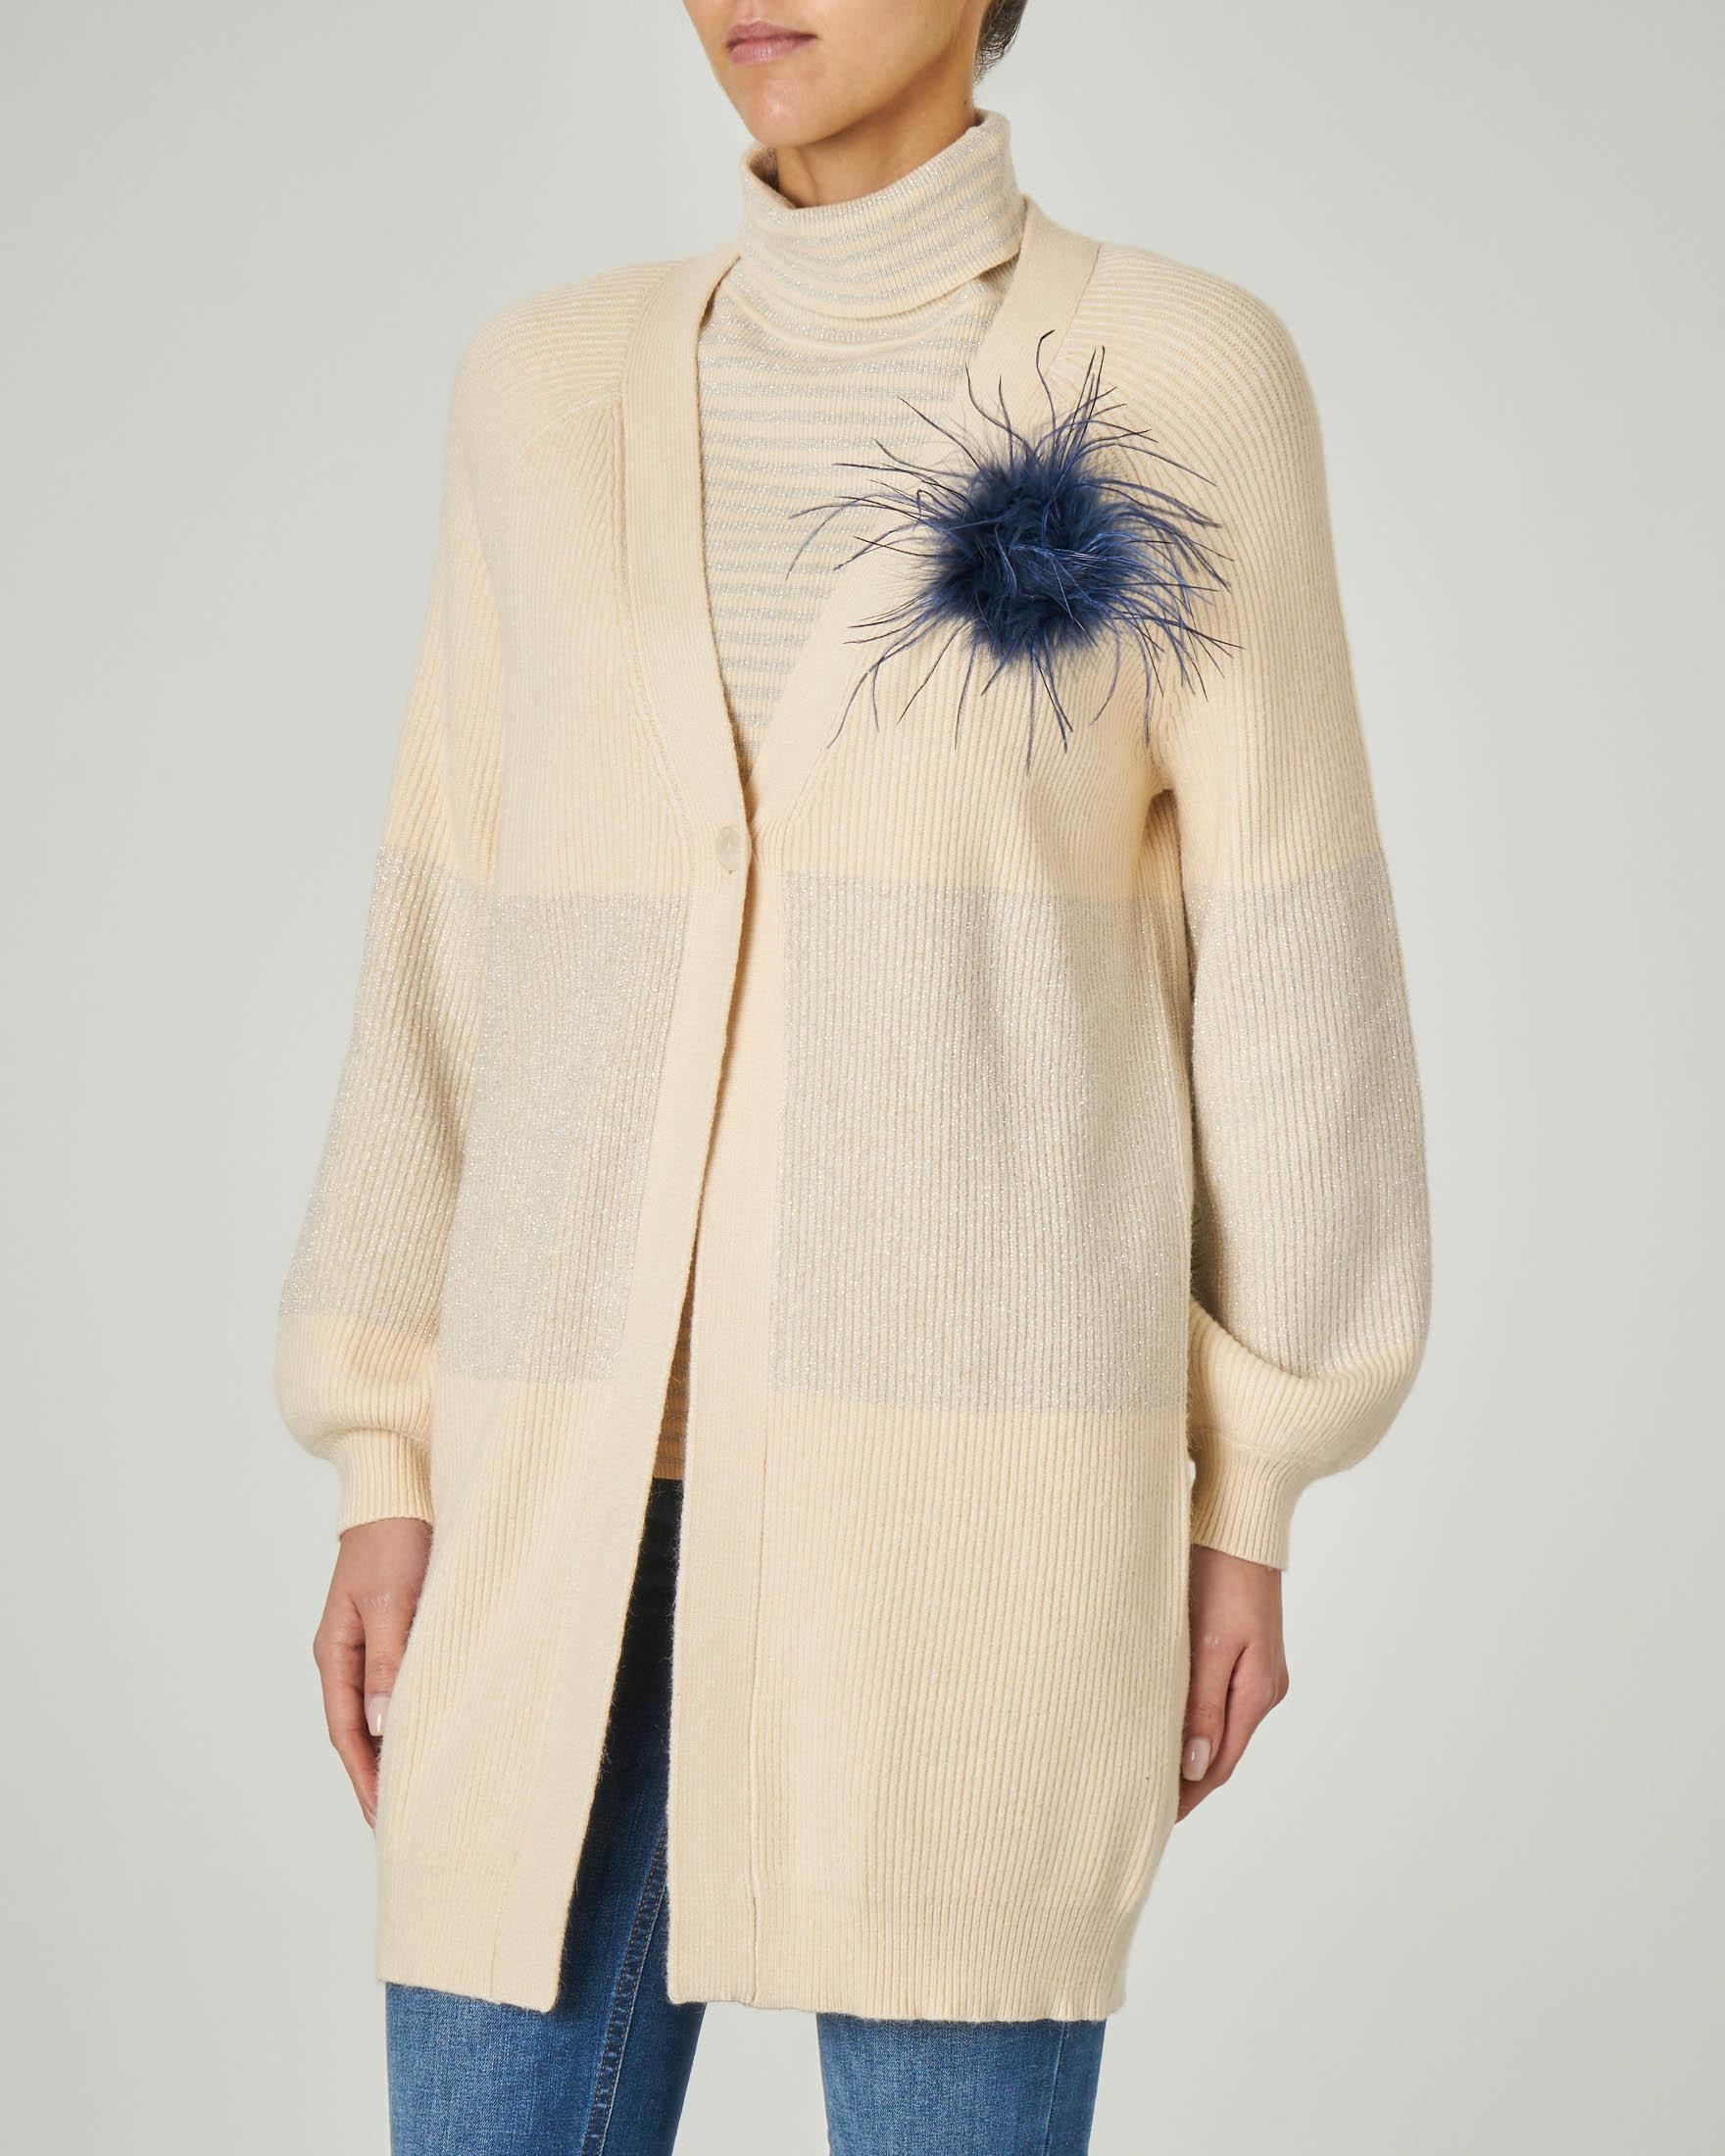 Cardigan color panna con inserti in lurex argento